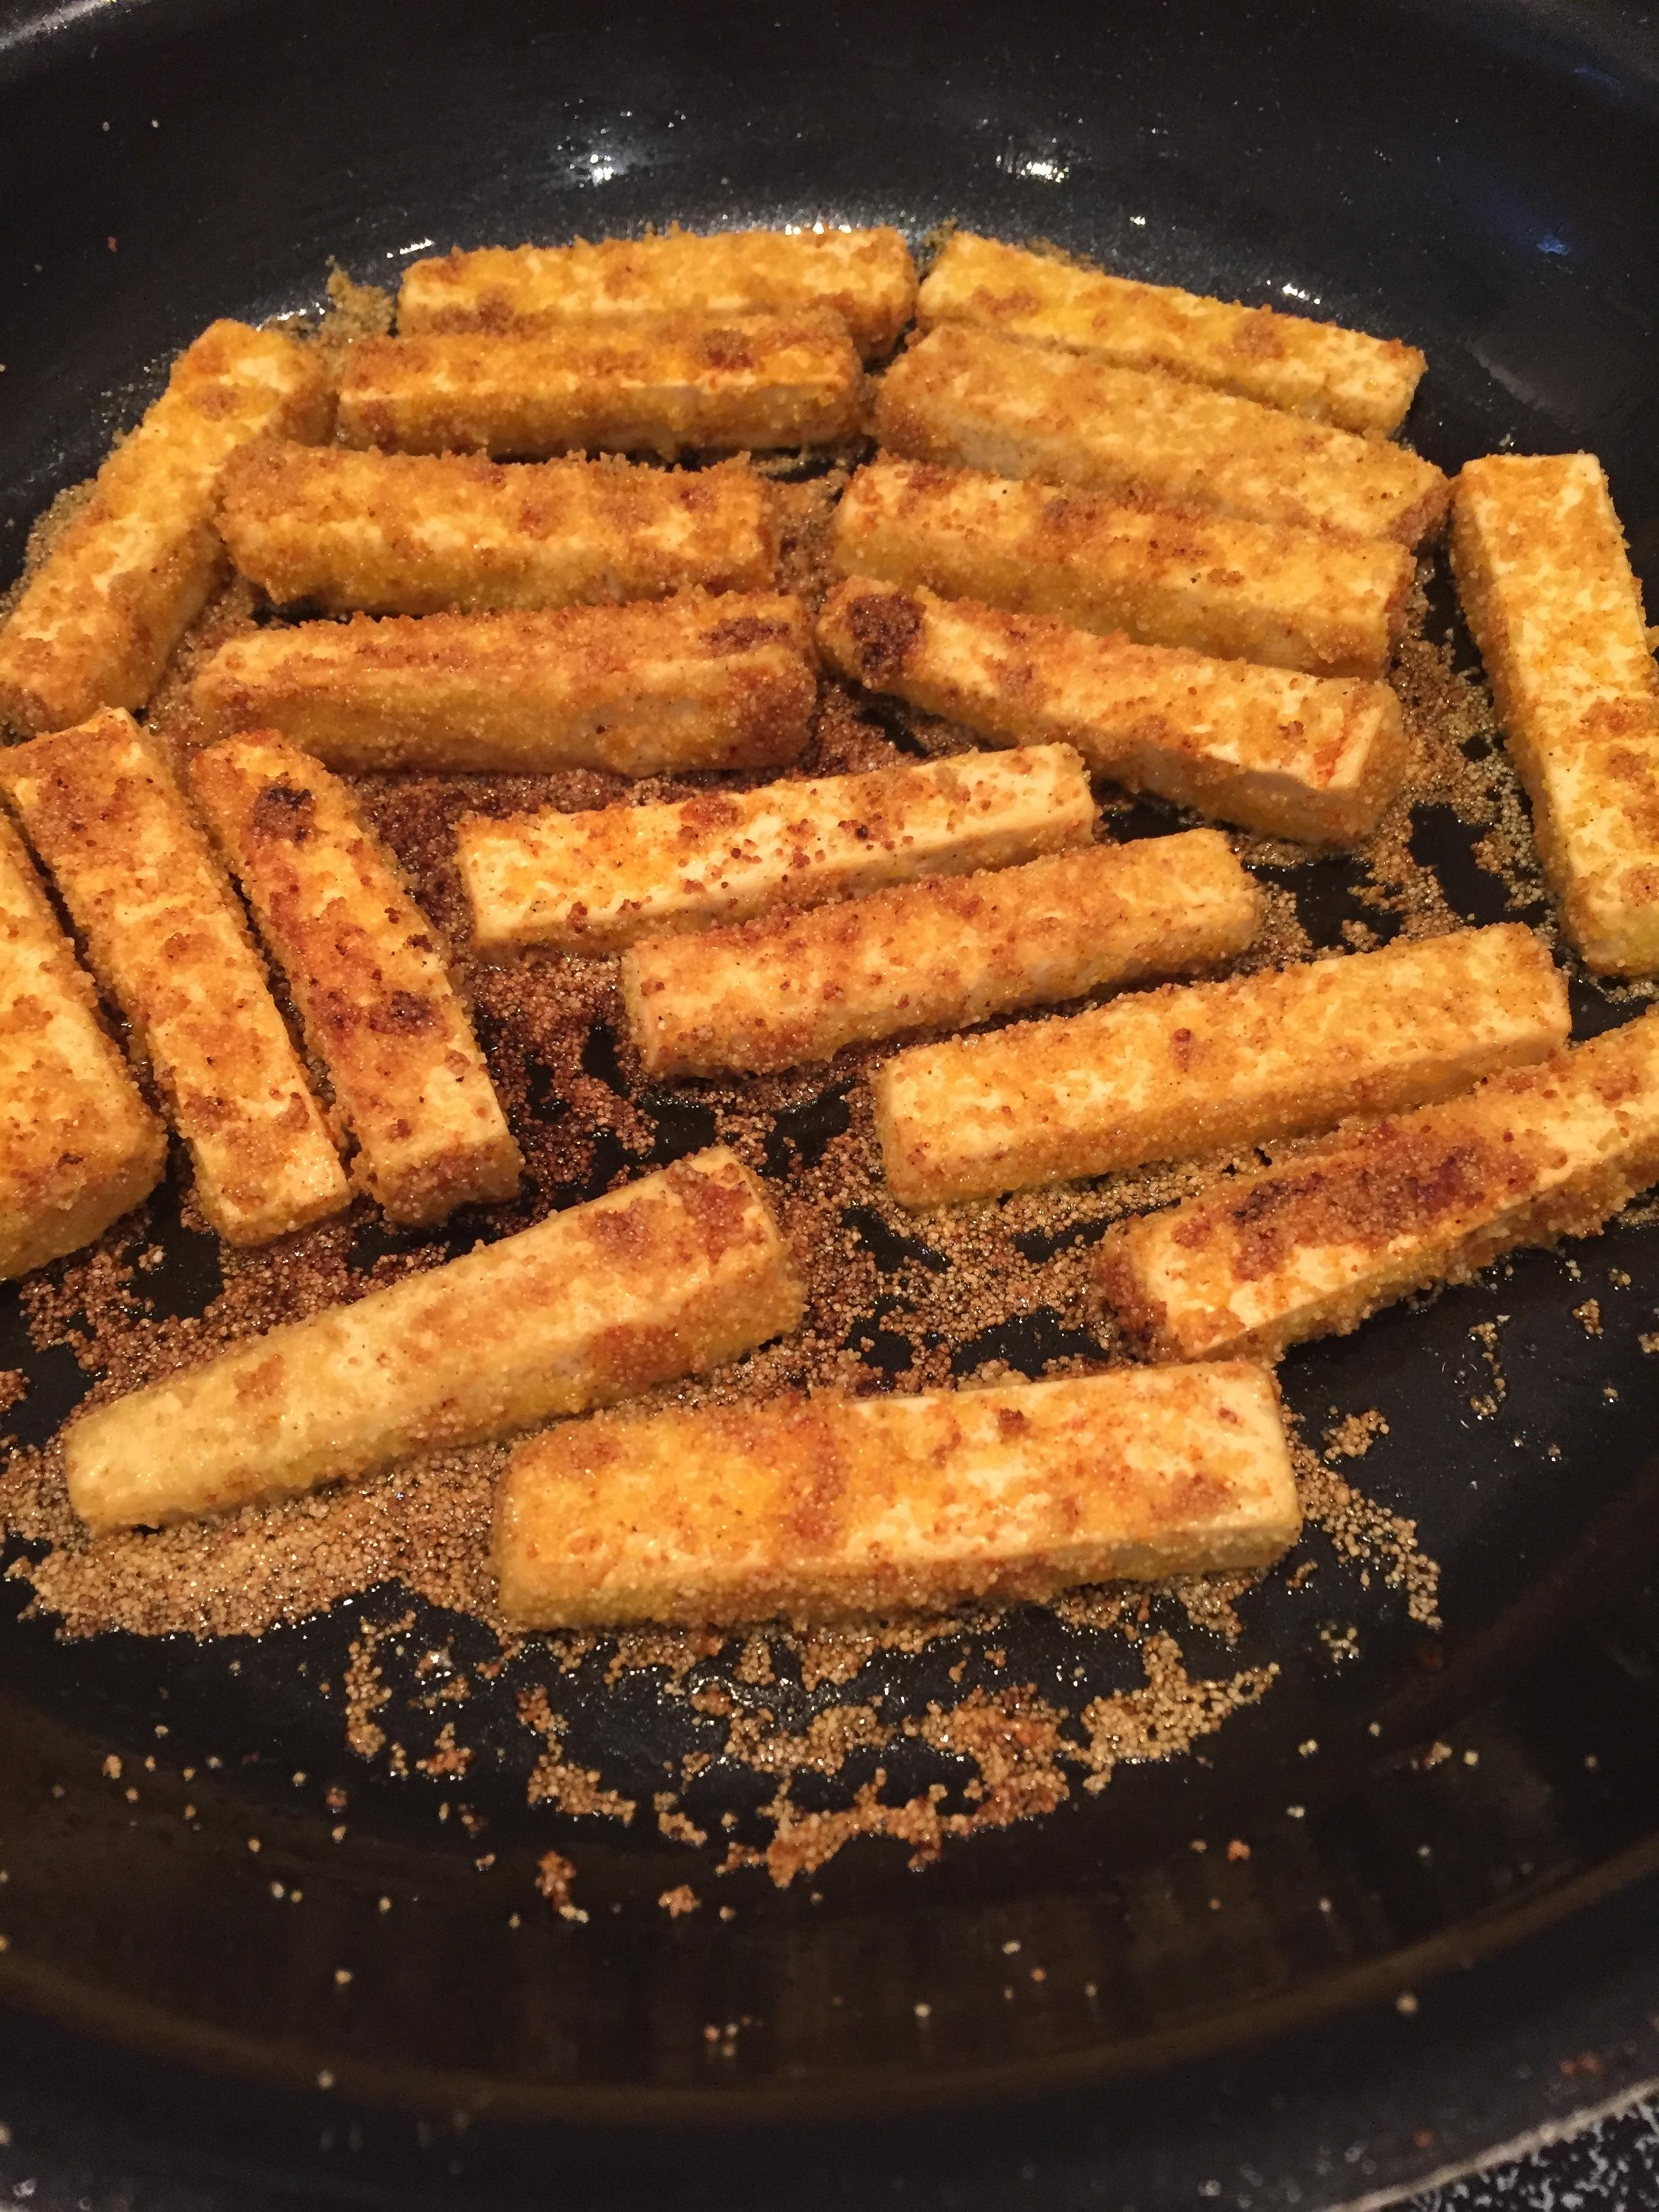 Tofu lightly fried in avocado oil